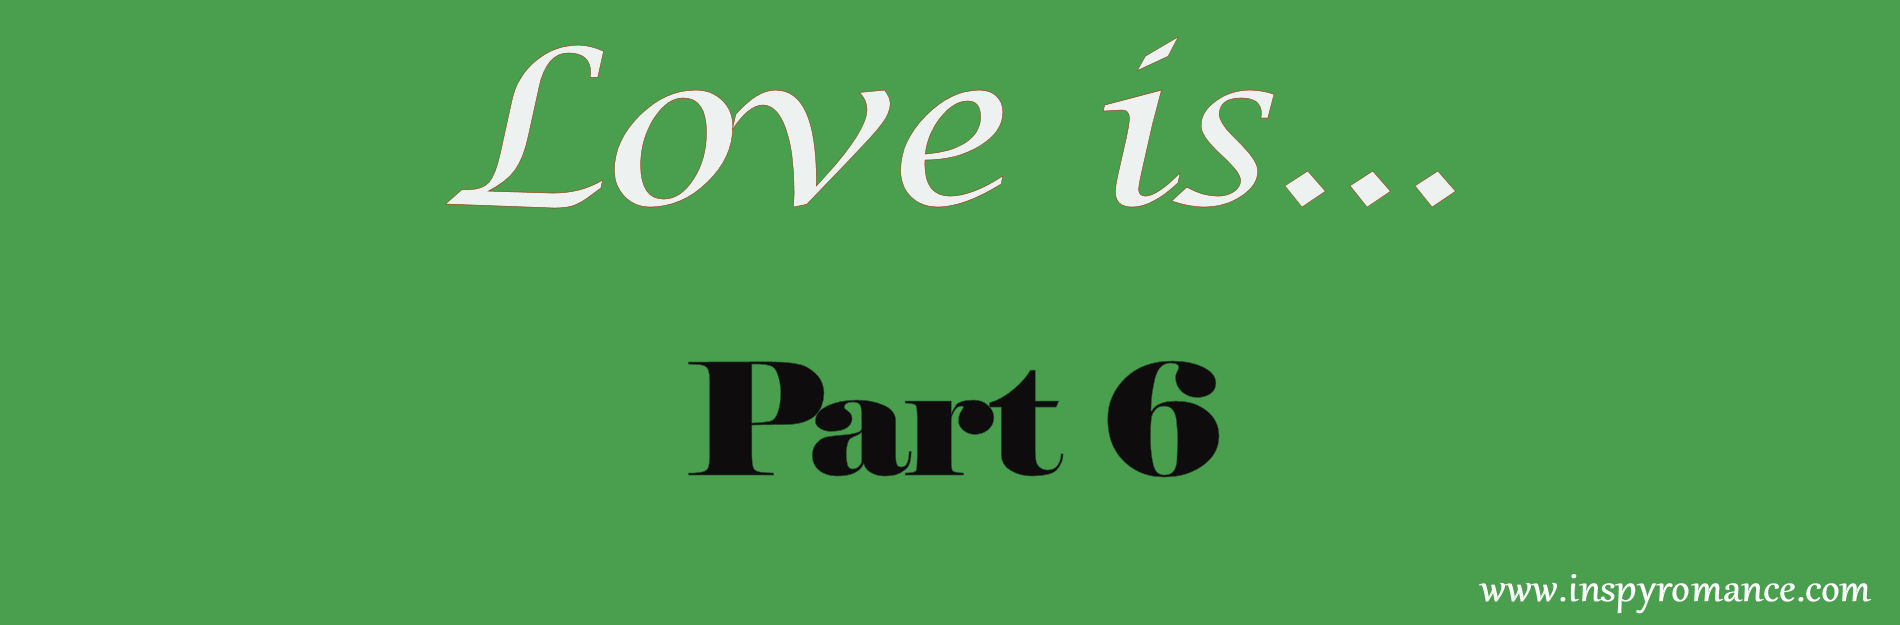 love is part 6-2